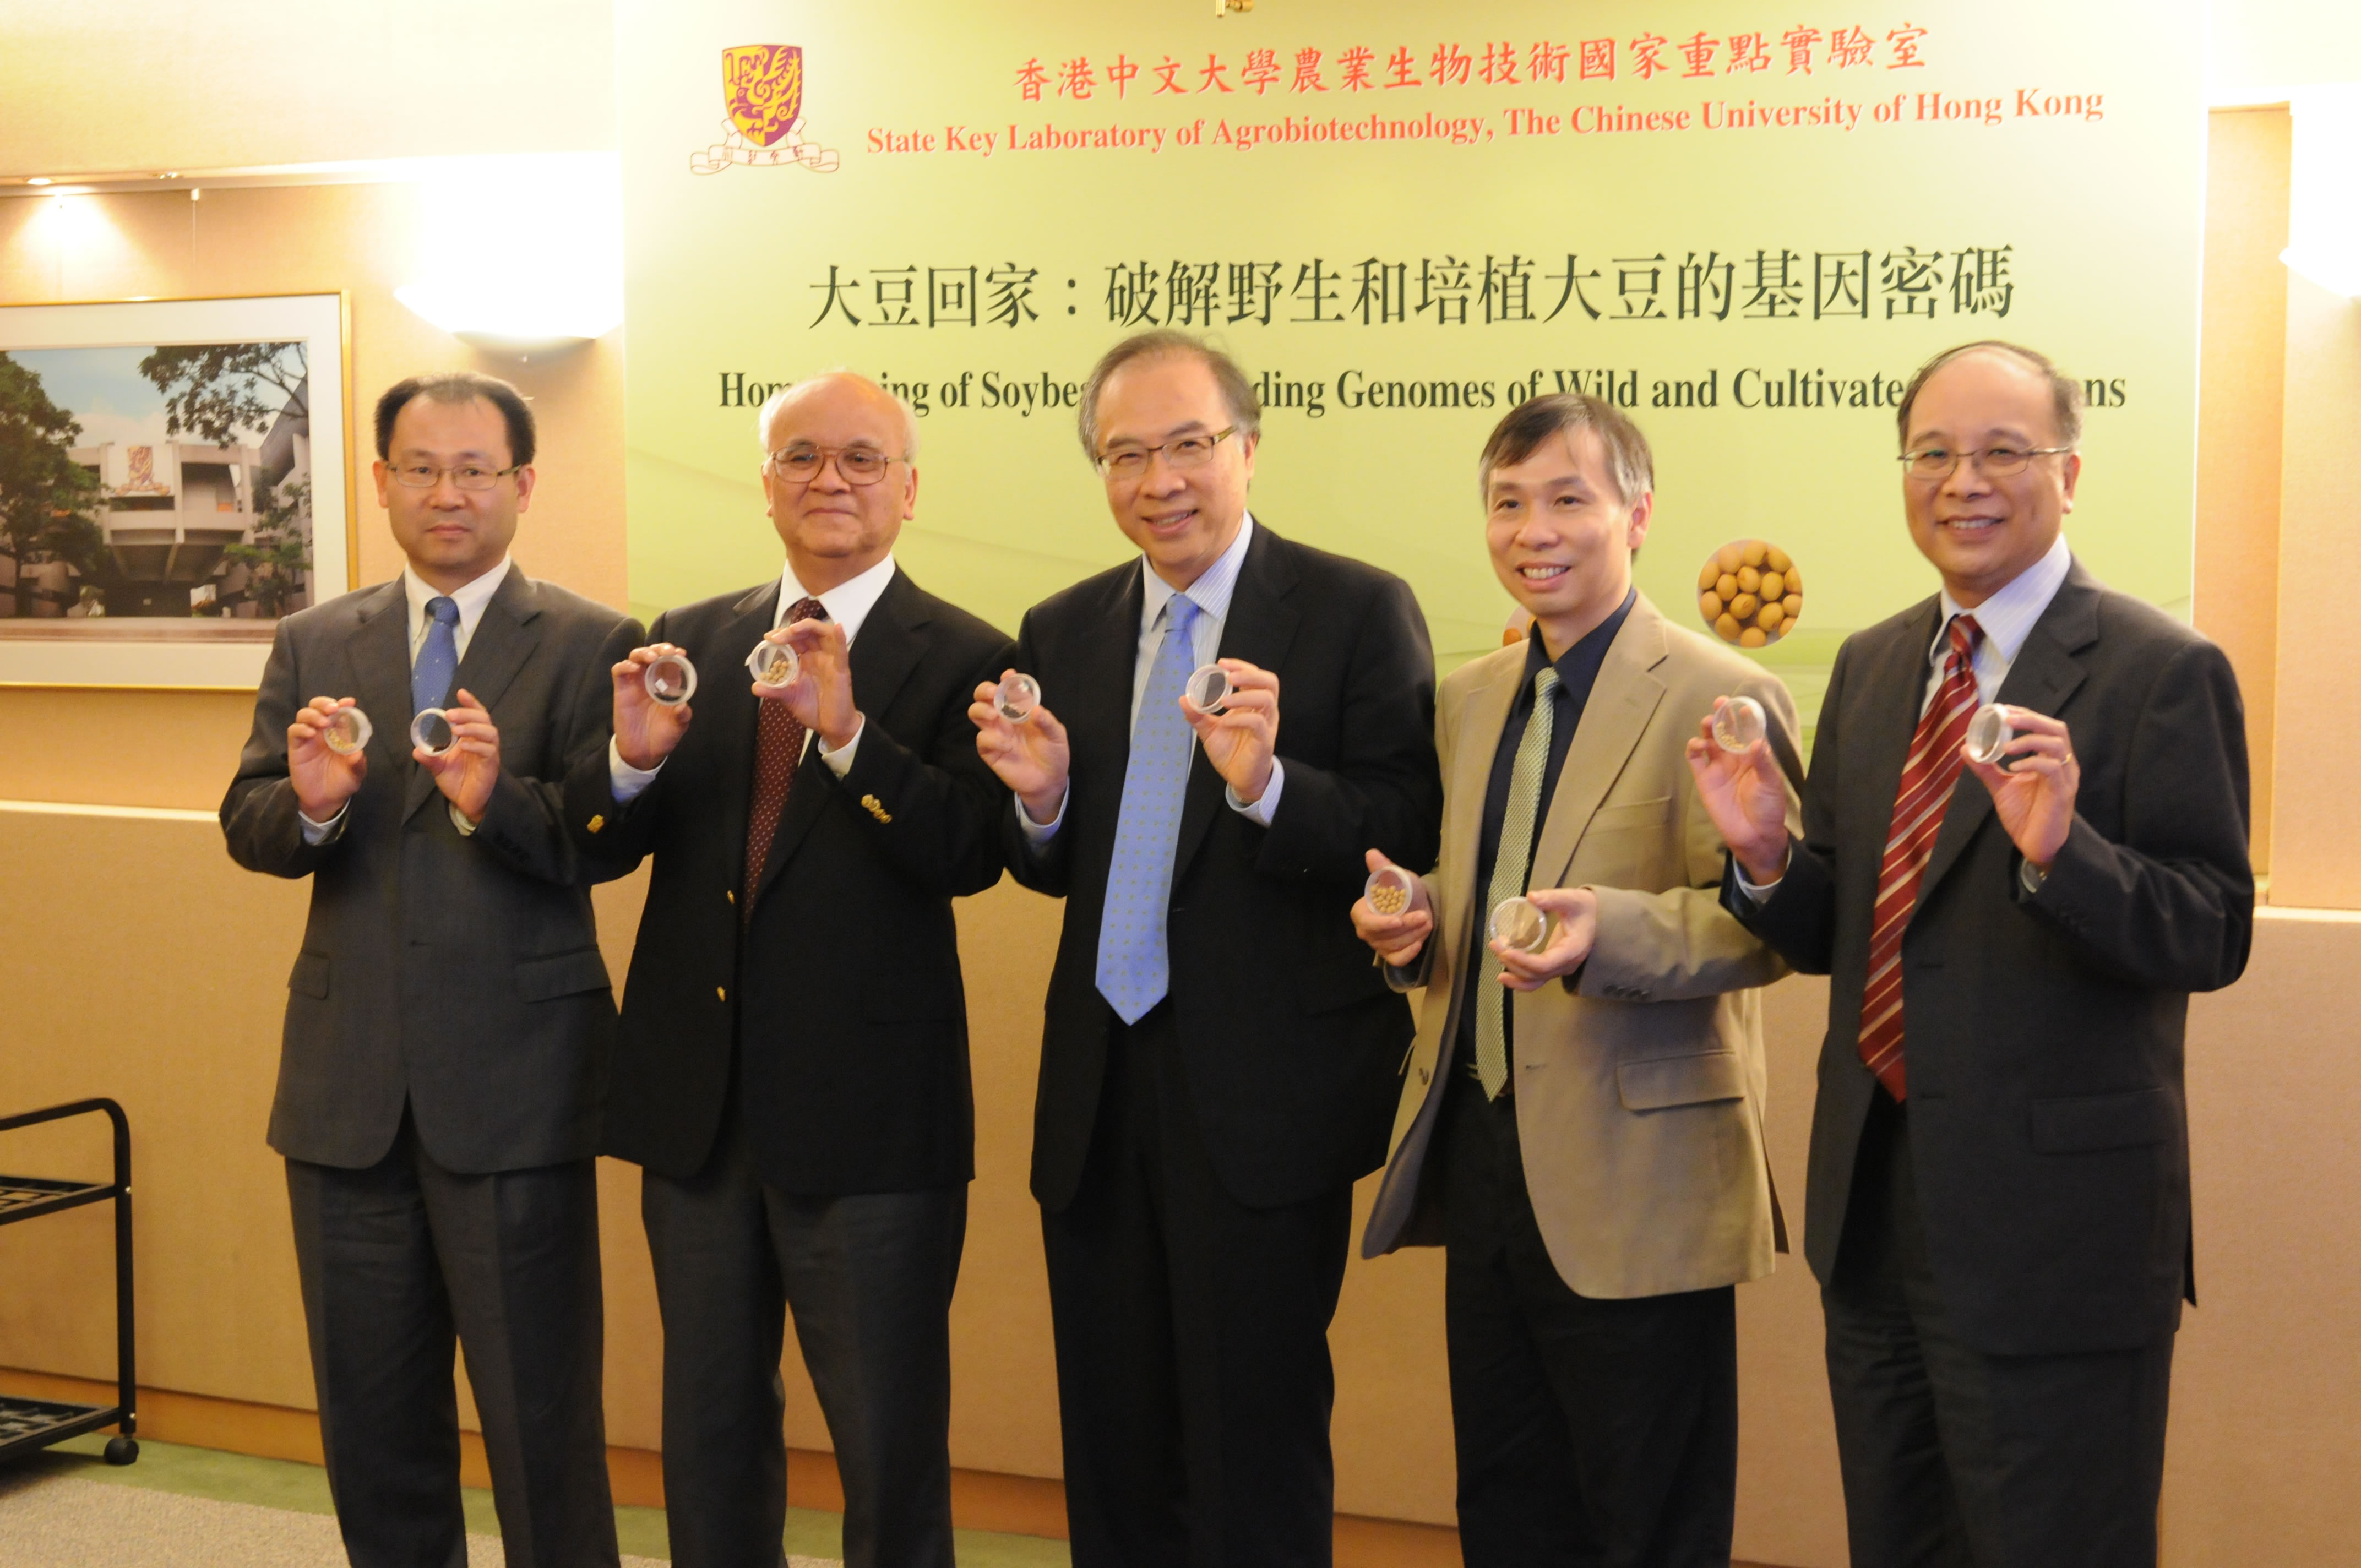 (From left) Prof. Xie Zuowei, Acting Dean, Faculty of Science, CUHK; Prof. Samuel S.M. Sun; Prof. Cheng Chun-yiu Jack, Pro-Vice-Chancellor, CUHK; Prof. Hon-ming Lam; and Prof. Chu Ka-hou, Acting Director, School of Life Sciences, CUHK